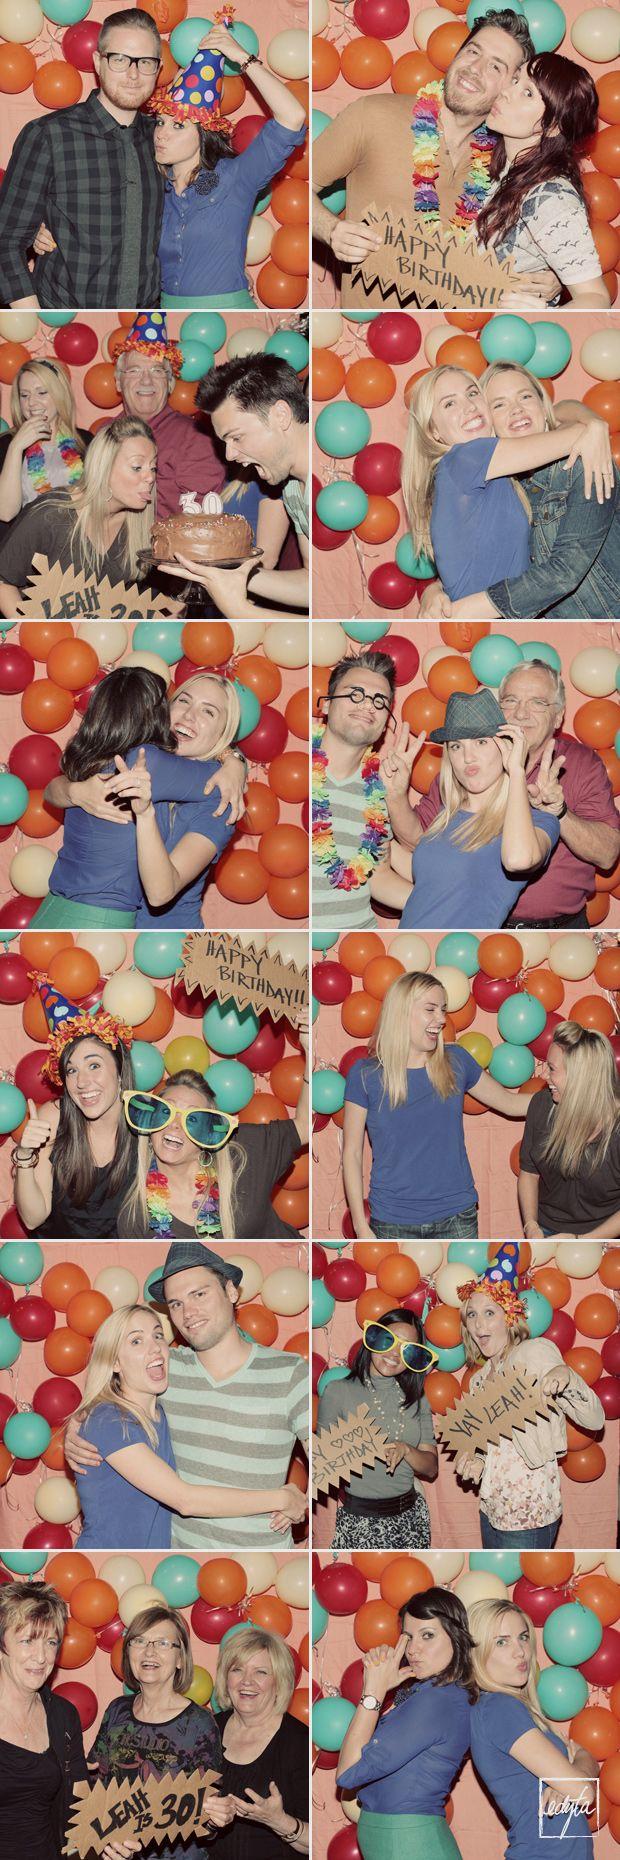 balloon background, cardboard photo props/sentiments - from Edyta Szyszlo's blog